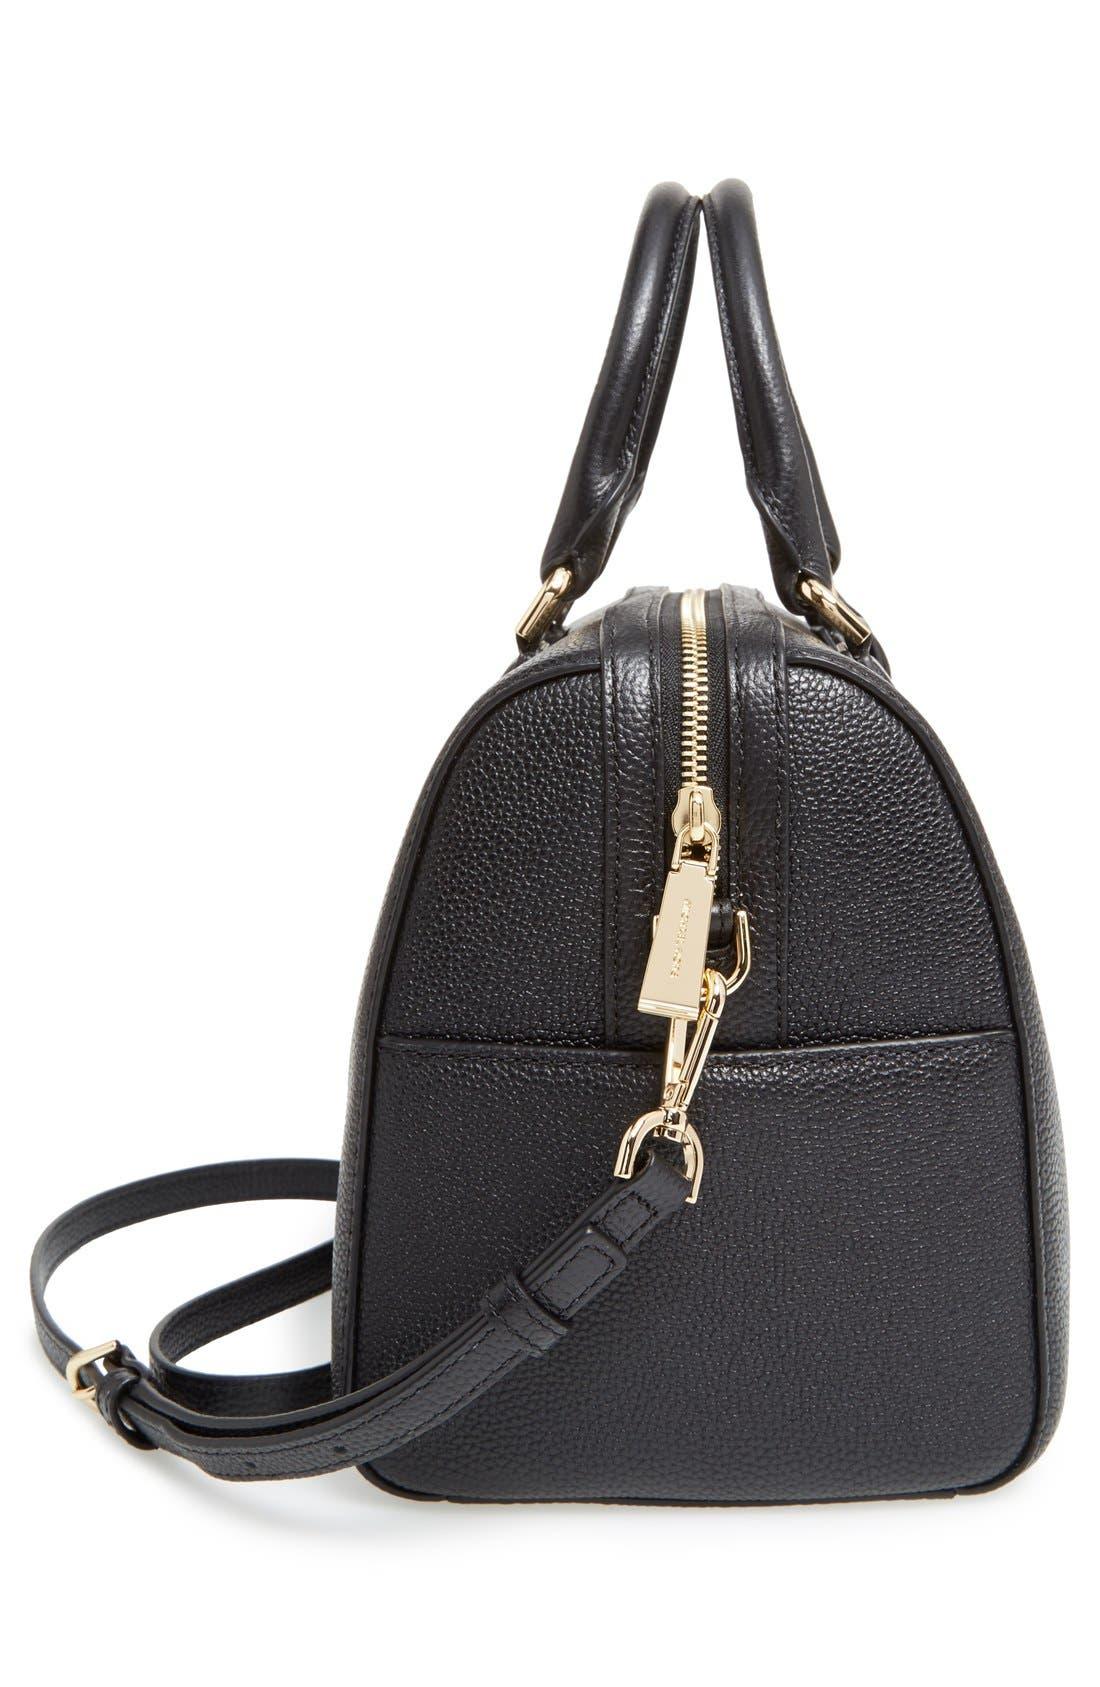 Medium Mercer Duffel Bag,                             Alternate thumbnail 5, color,                             Black/ Gold